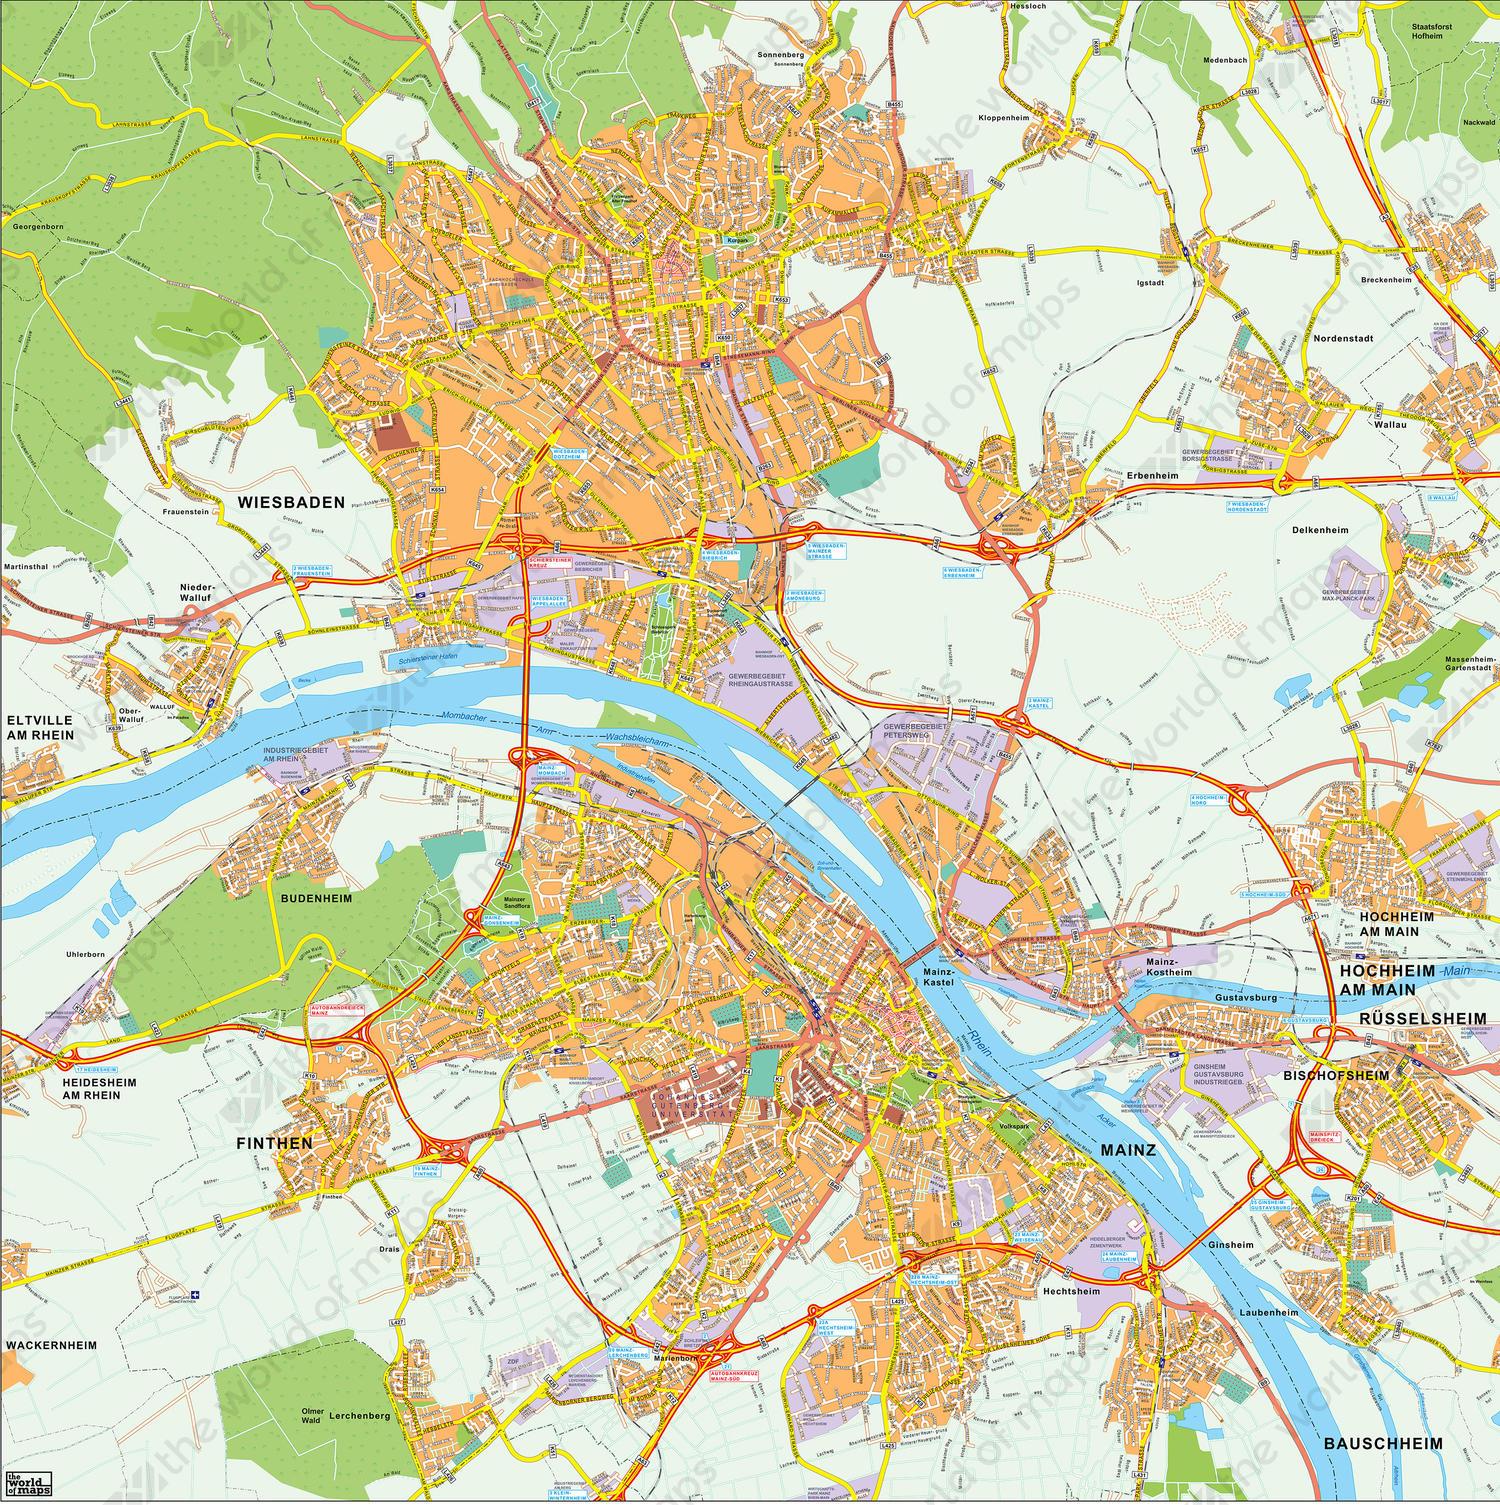 Digital City Map Wiesbaden Mainz 177 The World Of Maps Com